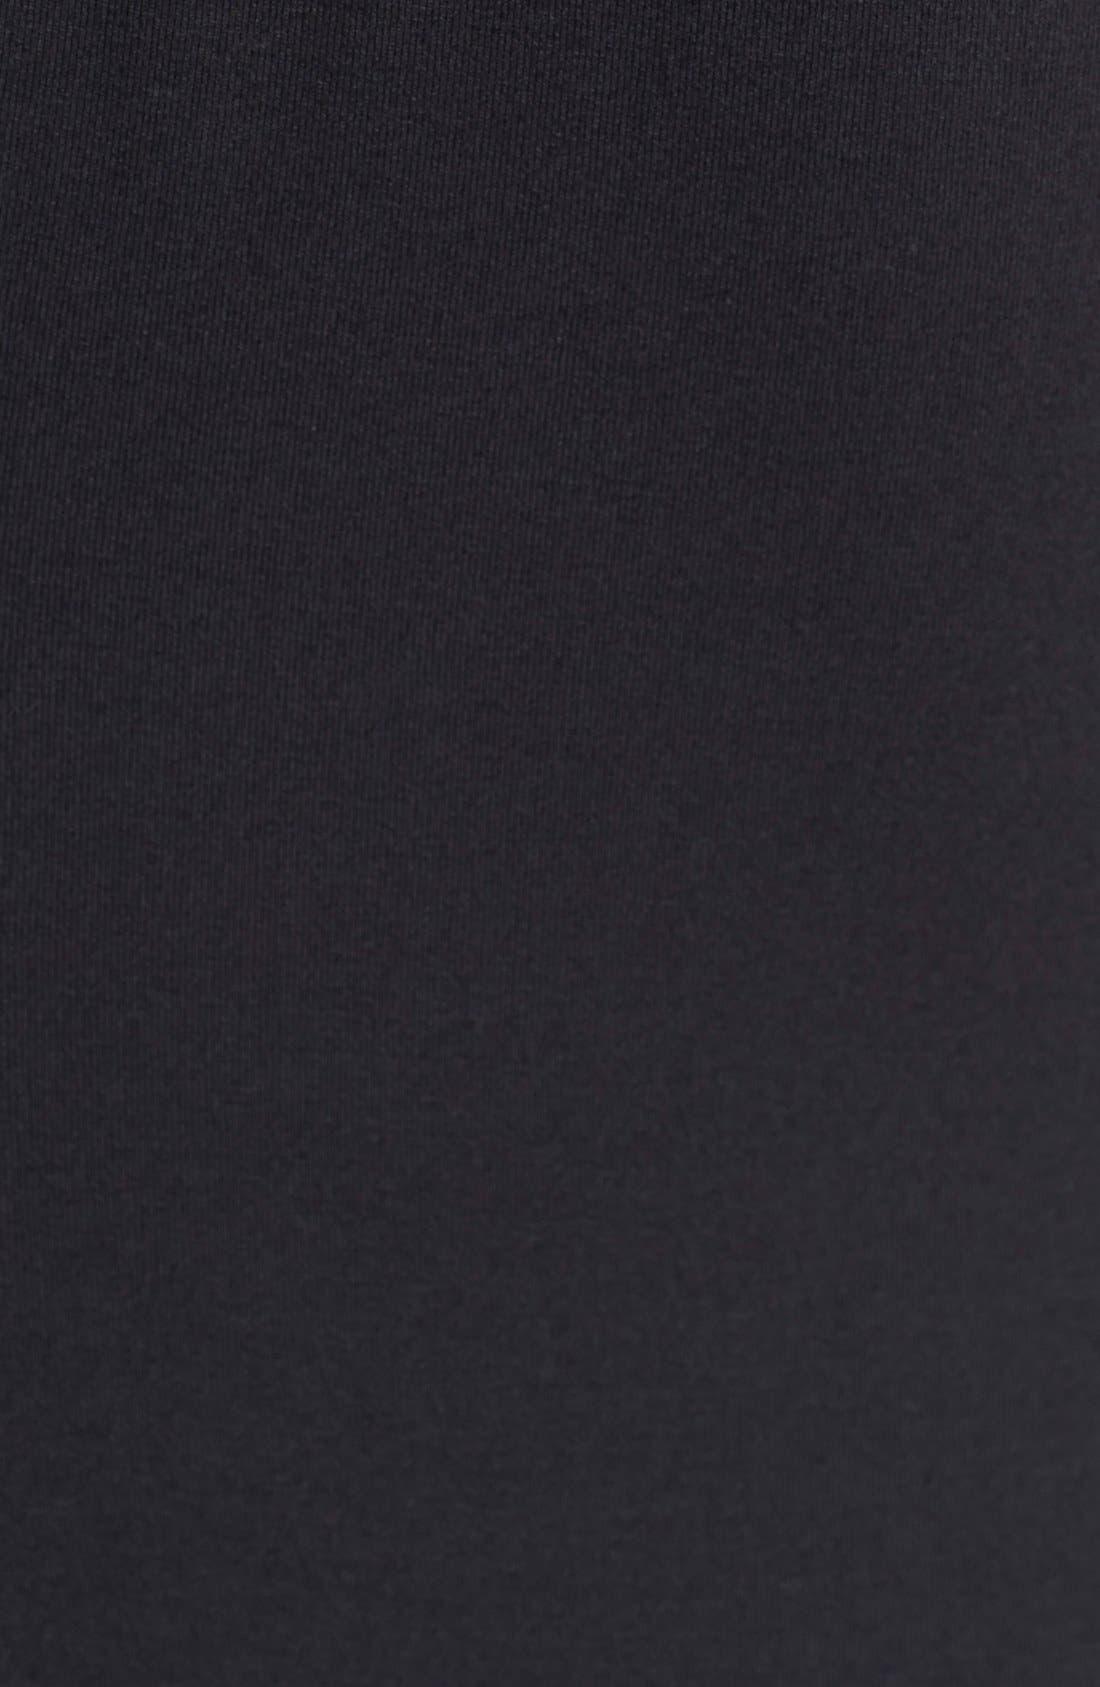 Alternate Image 3  - Tommy Bahama 'Gower' Illusion Neck Jersey Dress